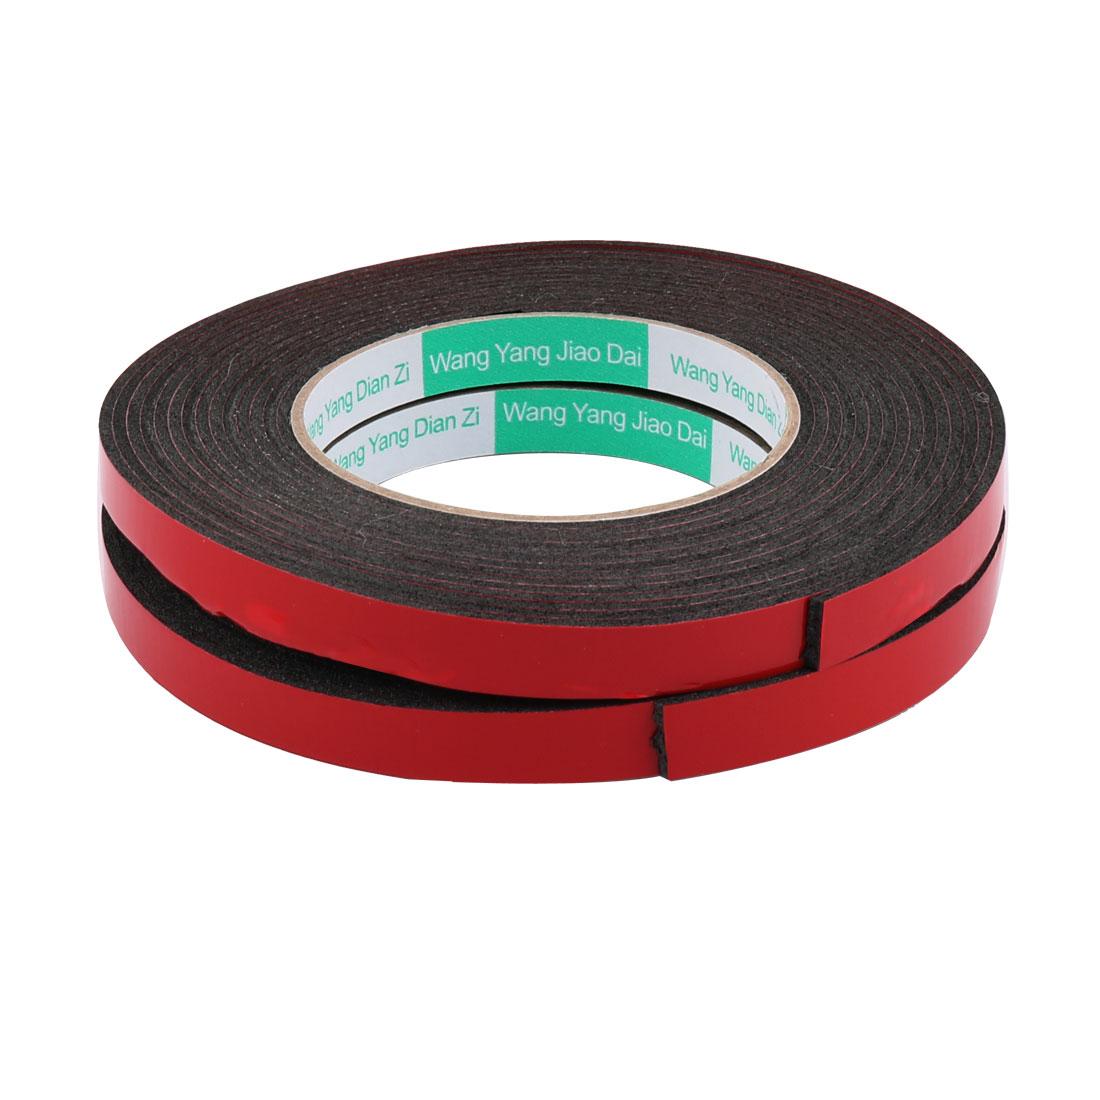 2pcs 1.2CM Width 5 Meters Length 2MM Thick Dual Sided Sealing Shockproof Sponge Tape